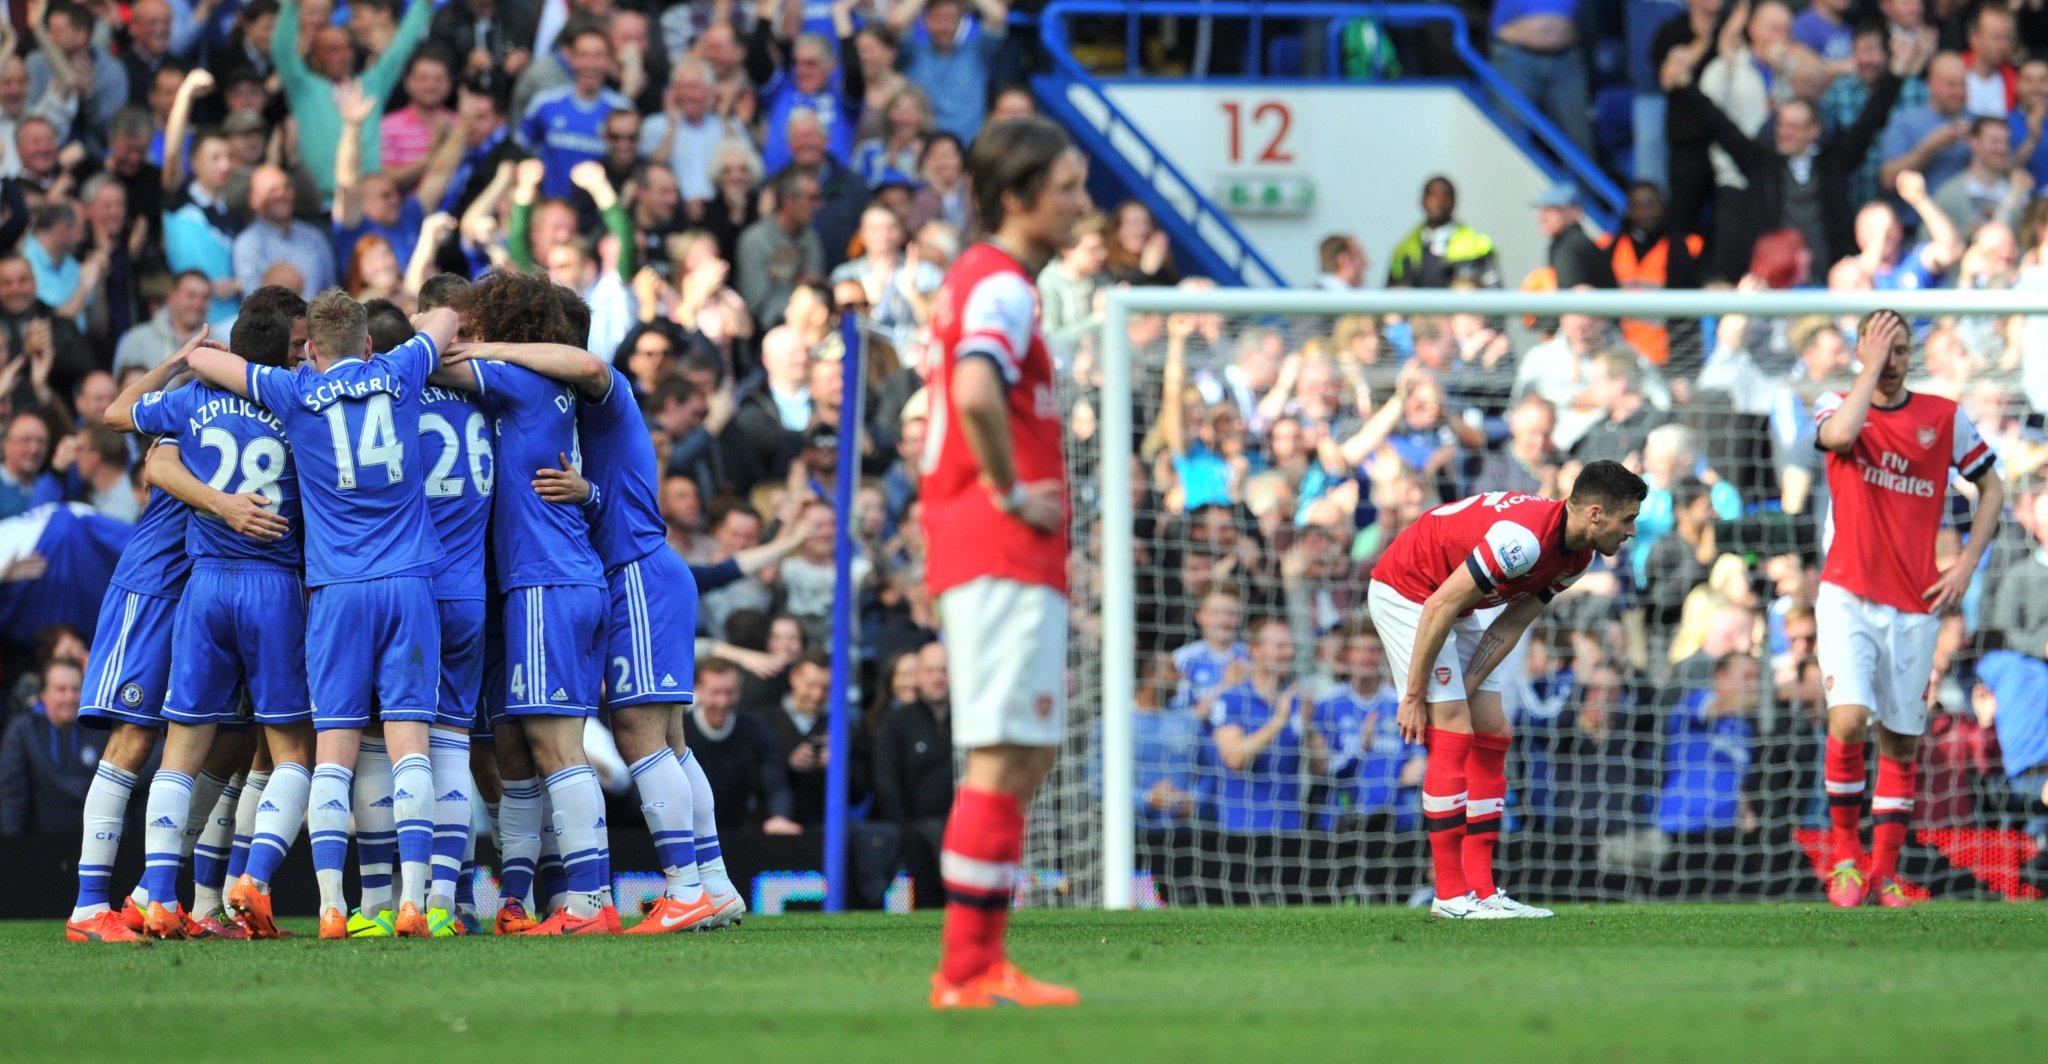 4️⃣ years ago today at Stamford Bridge...  Chelsea 6-0 Arsenal! �� https://t.co/L94OROqCwb